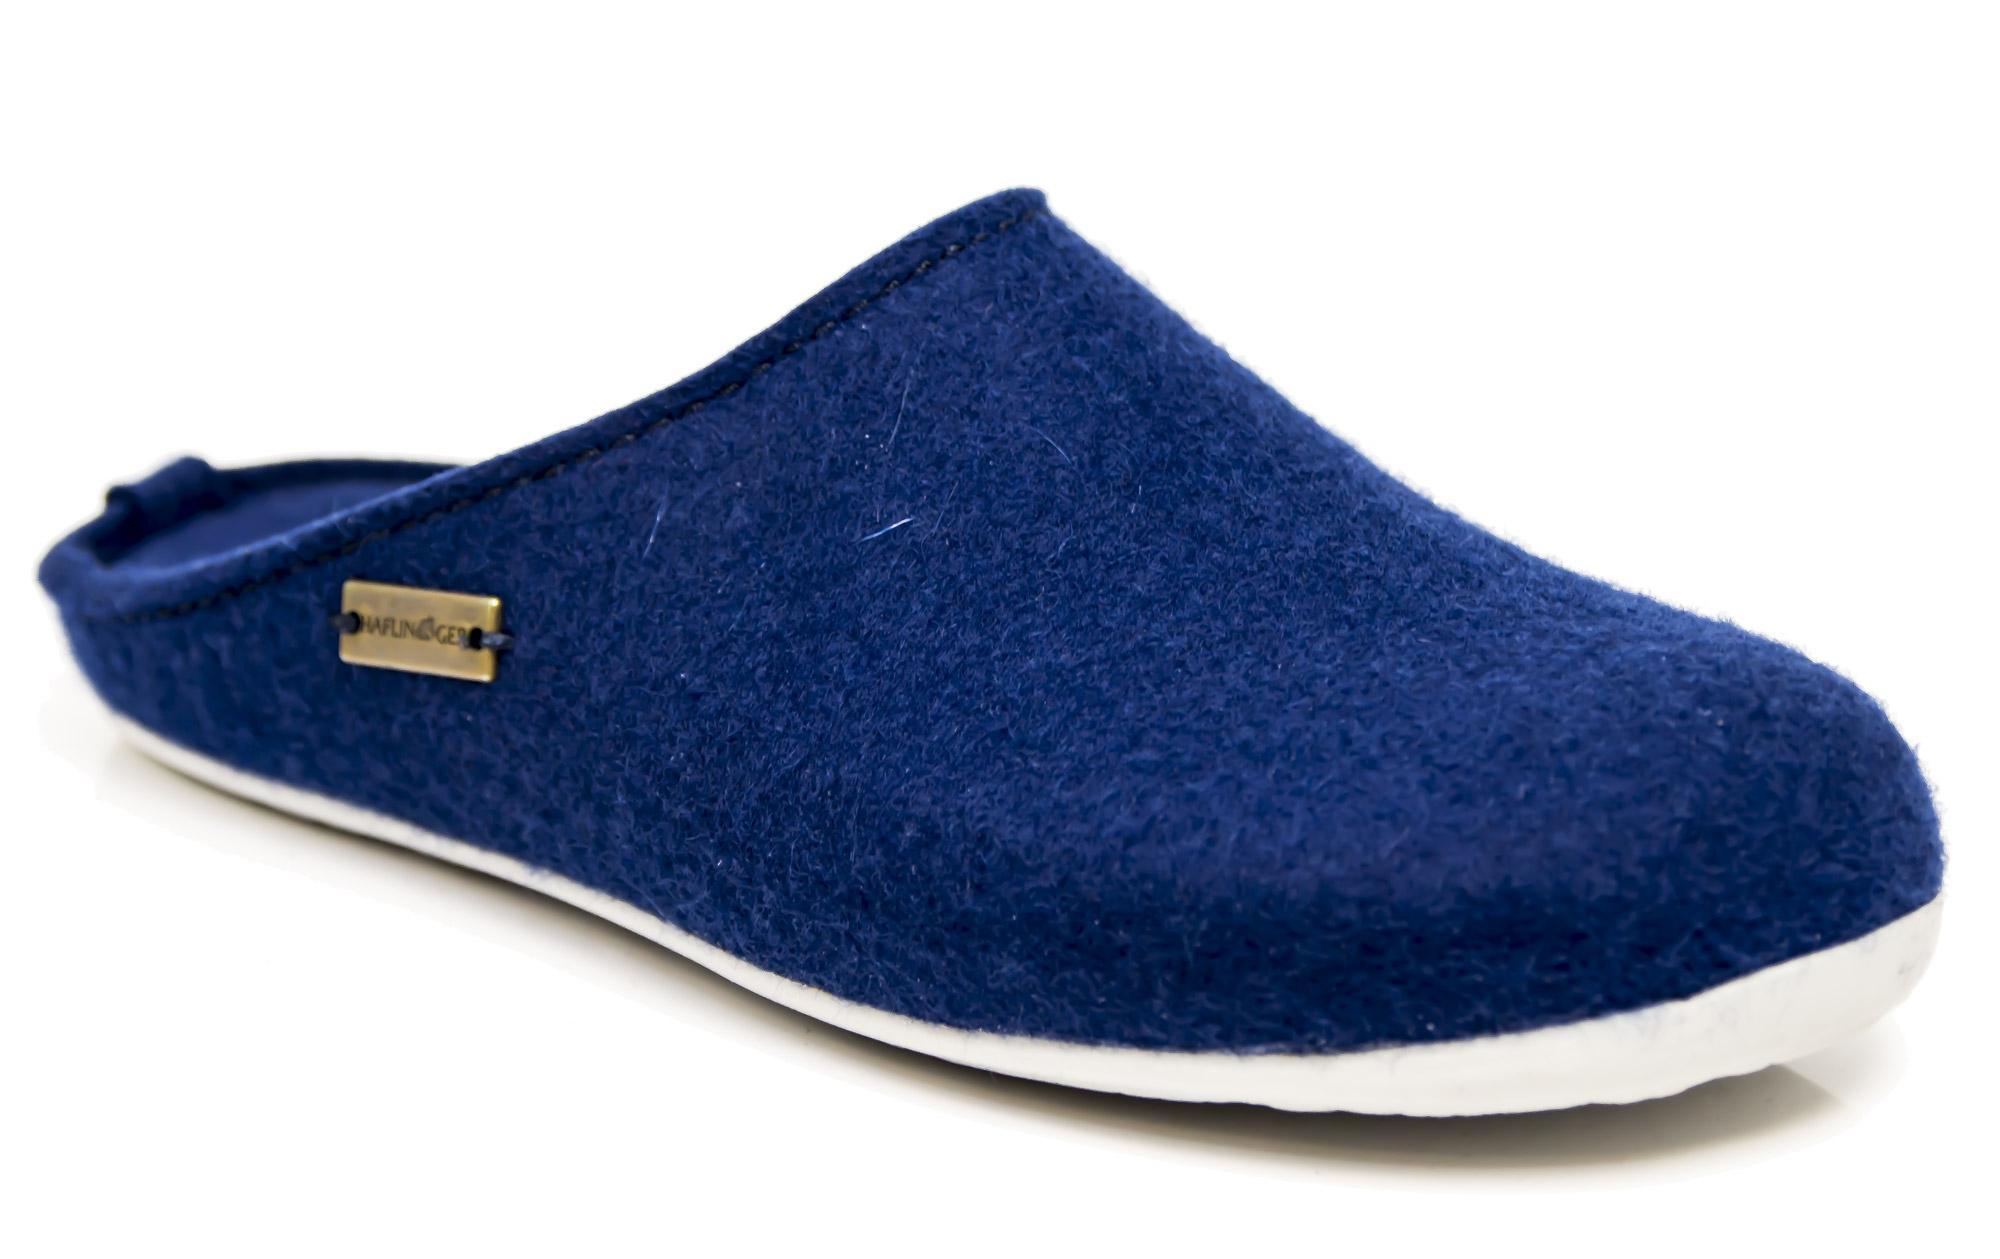 new style 98b8d 2b260 Dettagli su Pantofole HAFLINGER Everest 481024271 in lana cotta